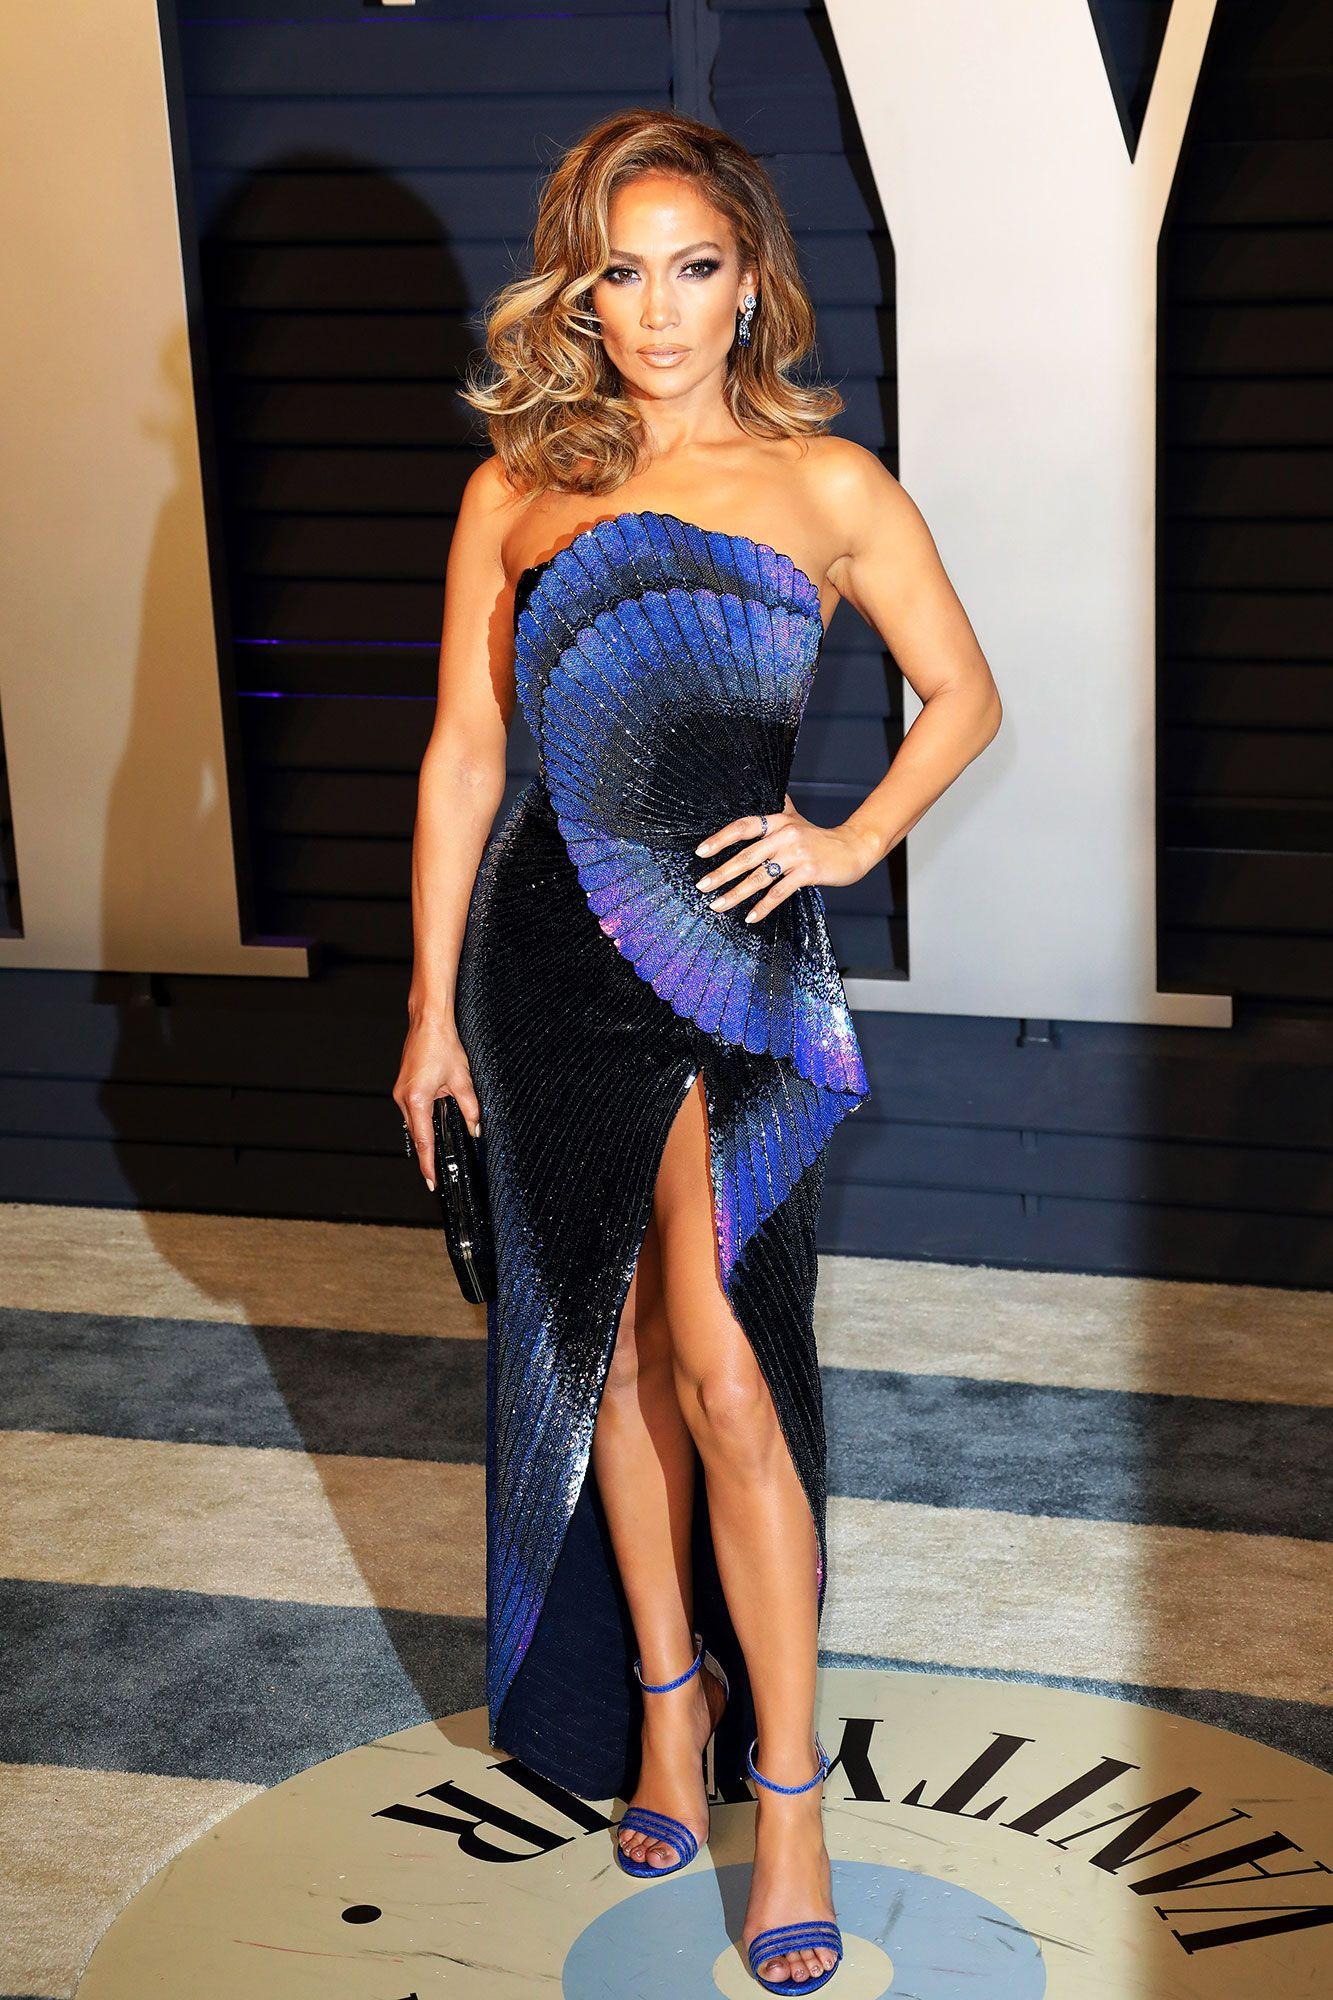 Jennifer Lopez's Makeup Artist Teaches His Glam Makeup